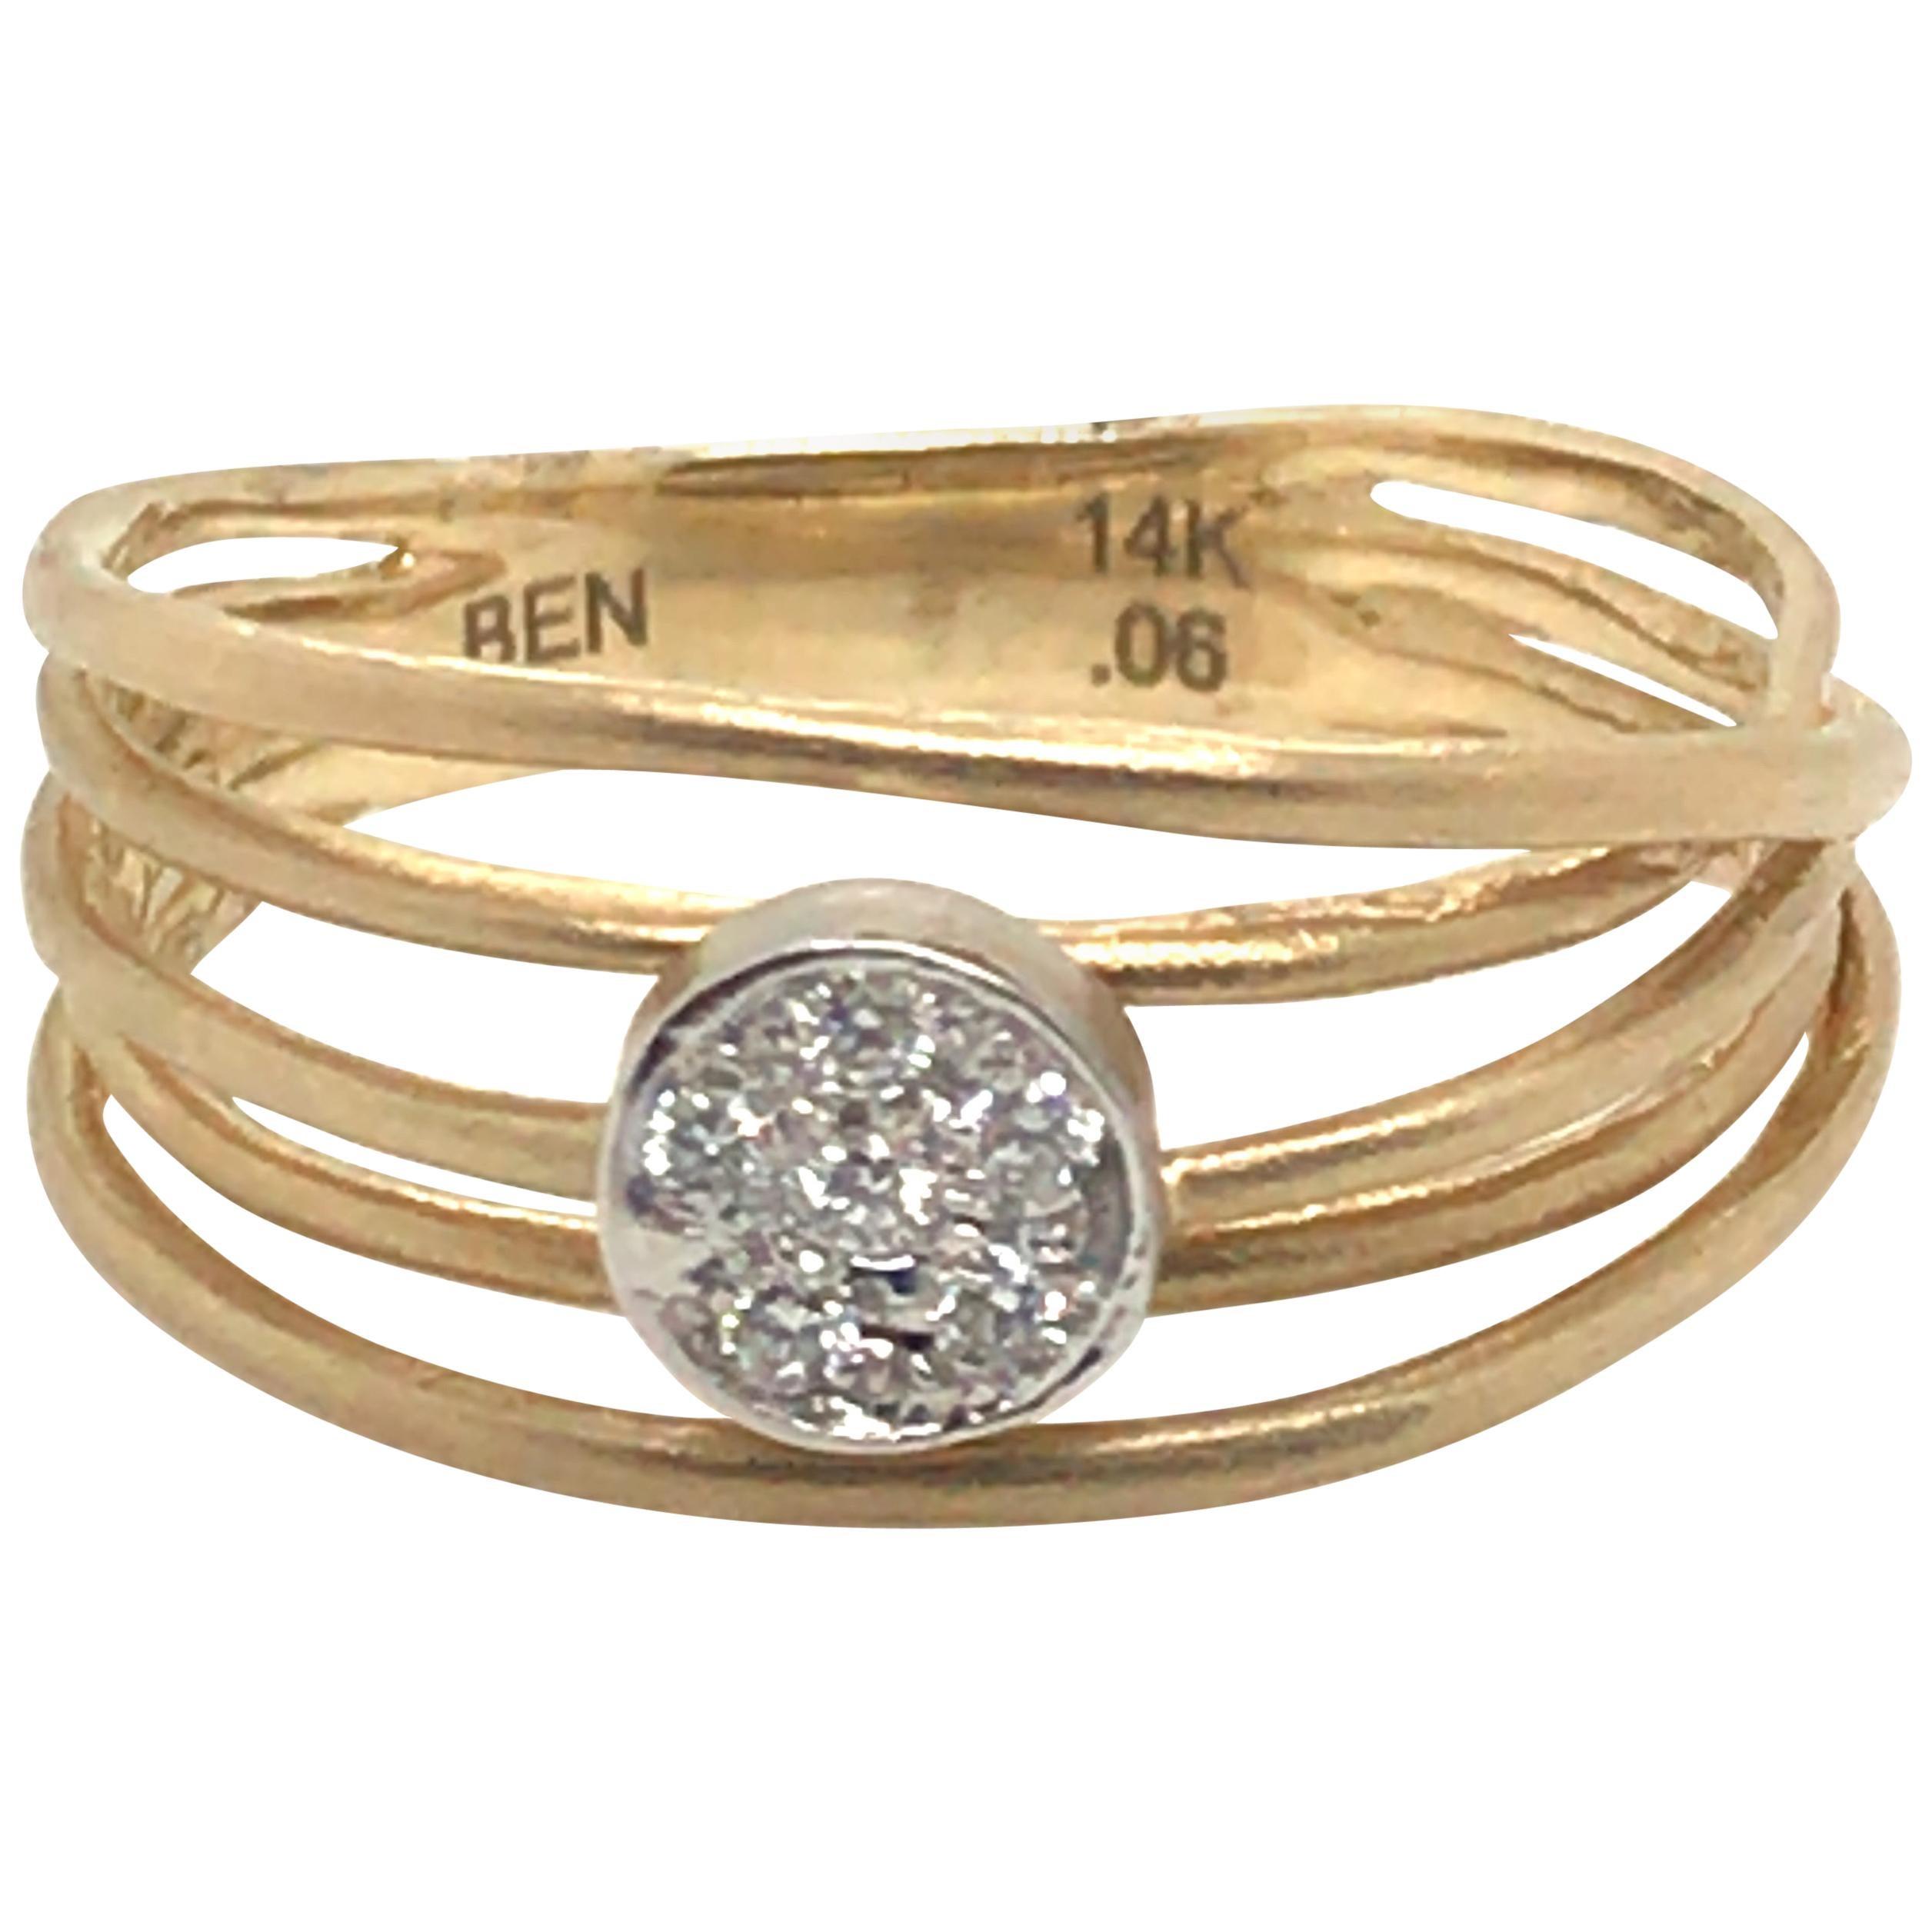 Curly Diamond Fashion Ring with 14 Karat Yellow Gold